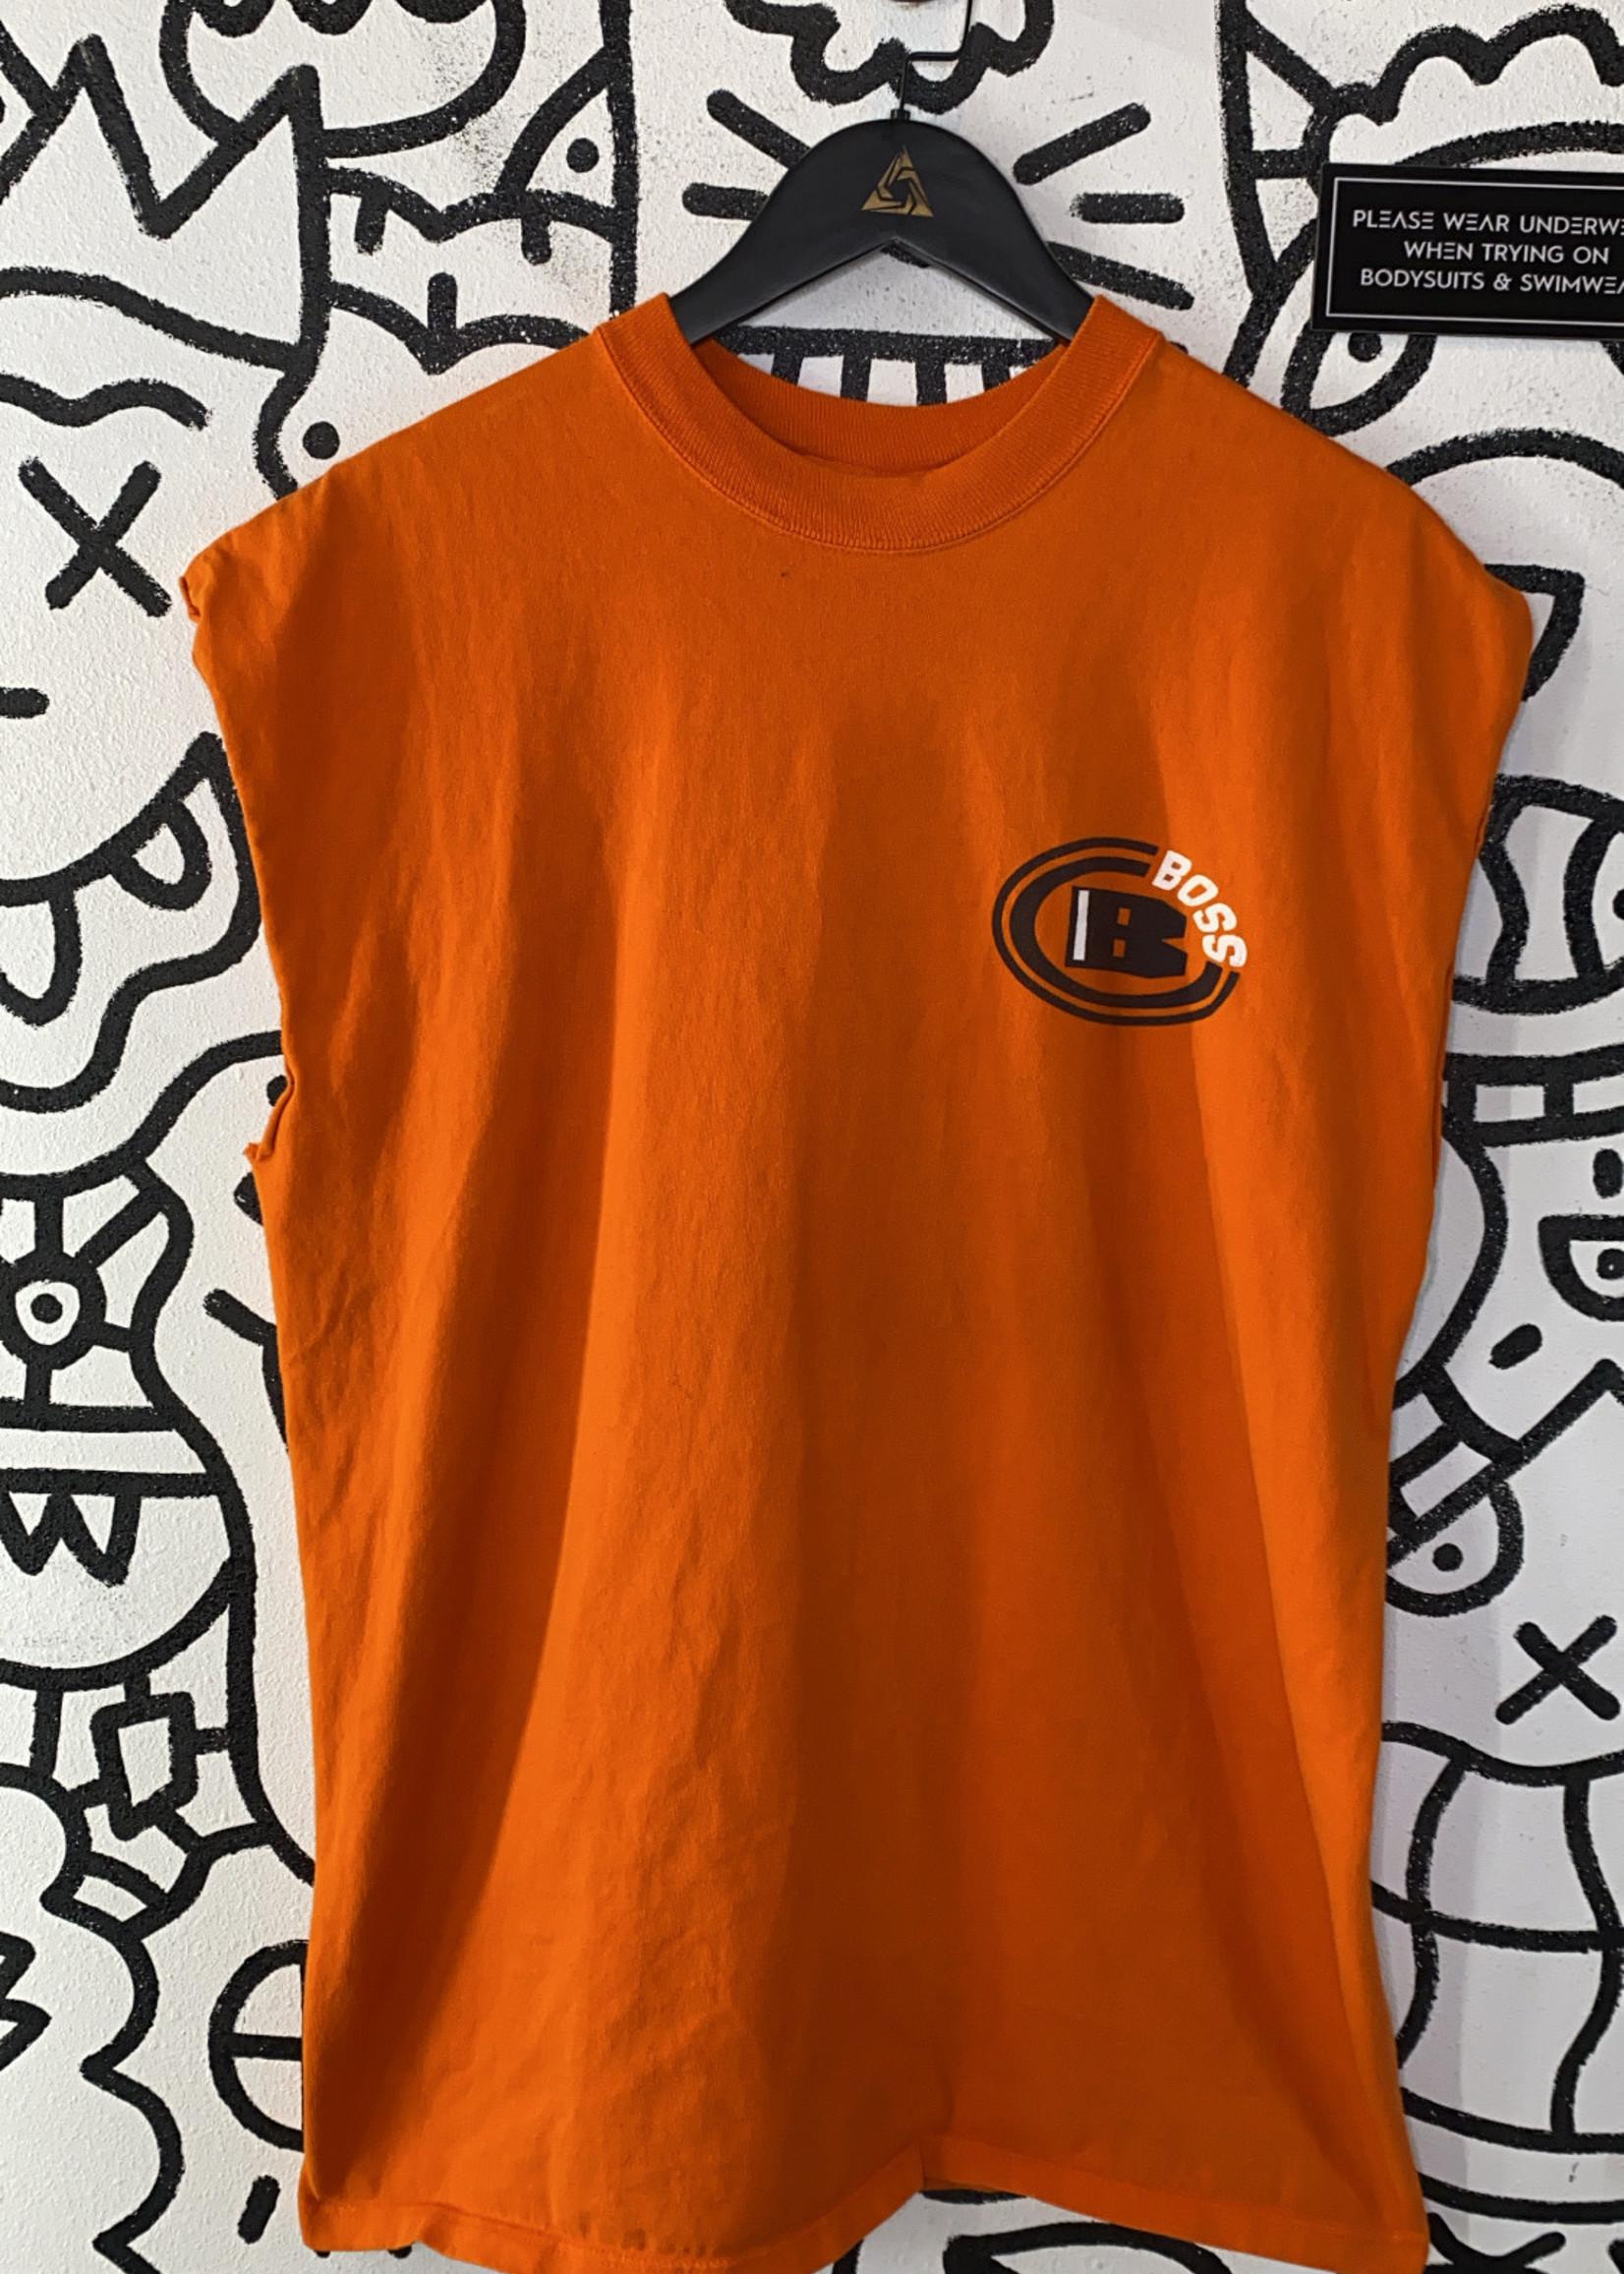 Vintage boss orange t shirt XL